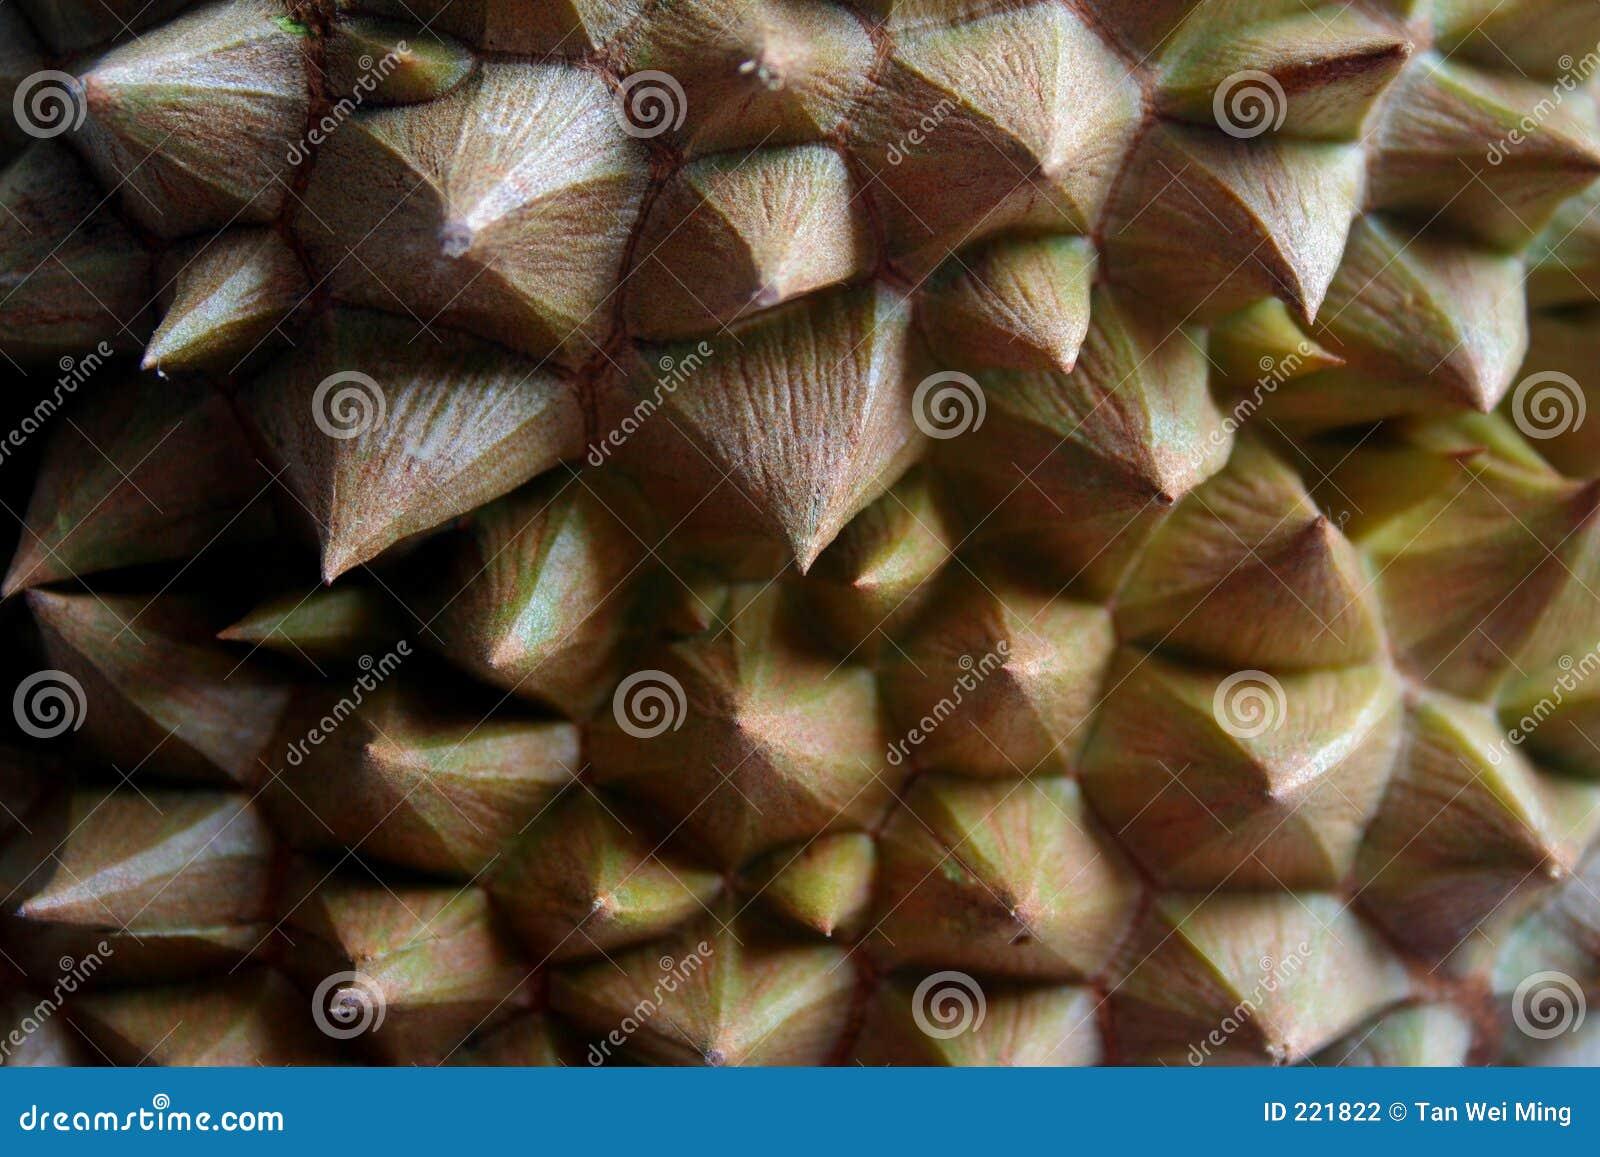 Thorny durian